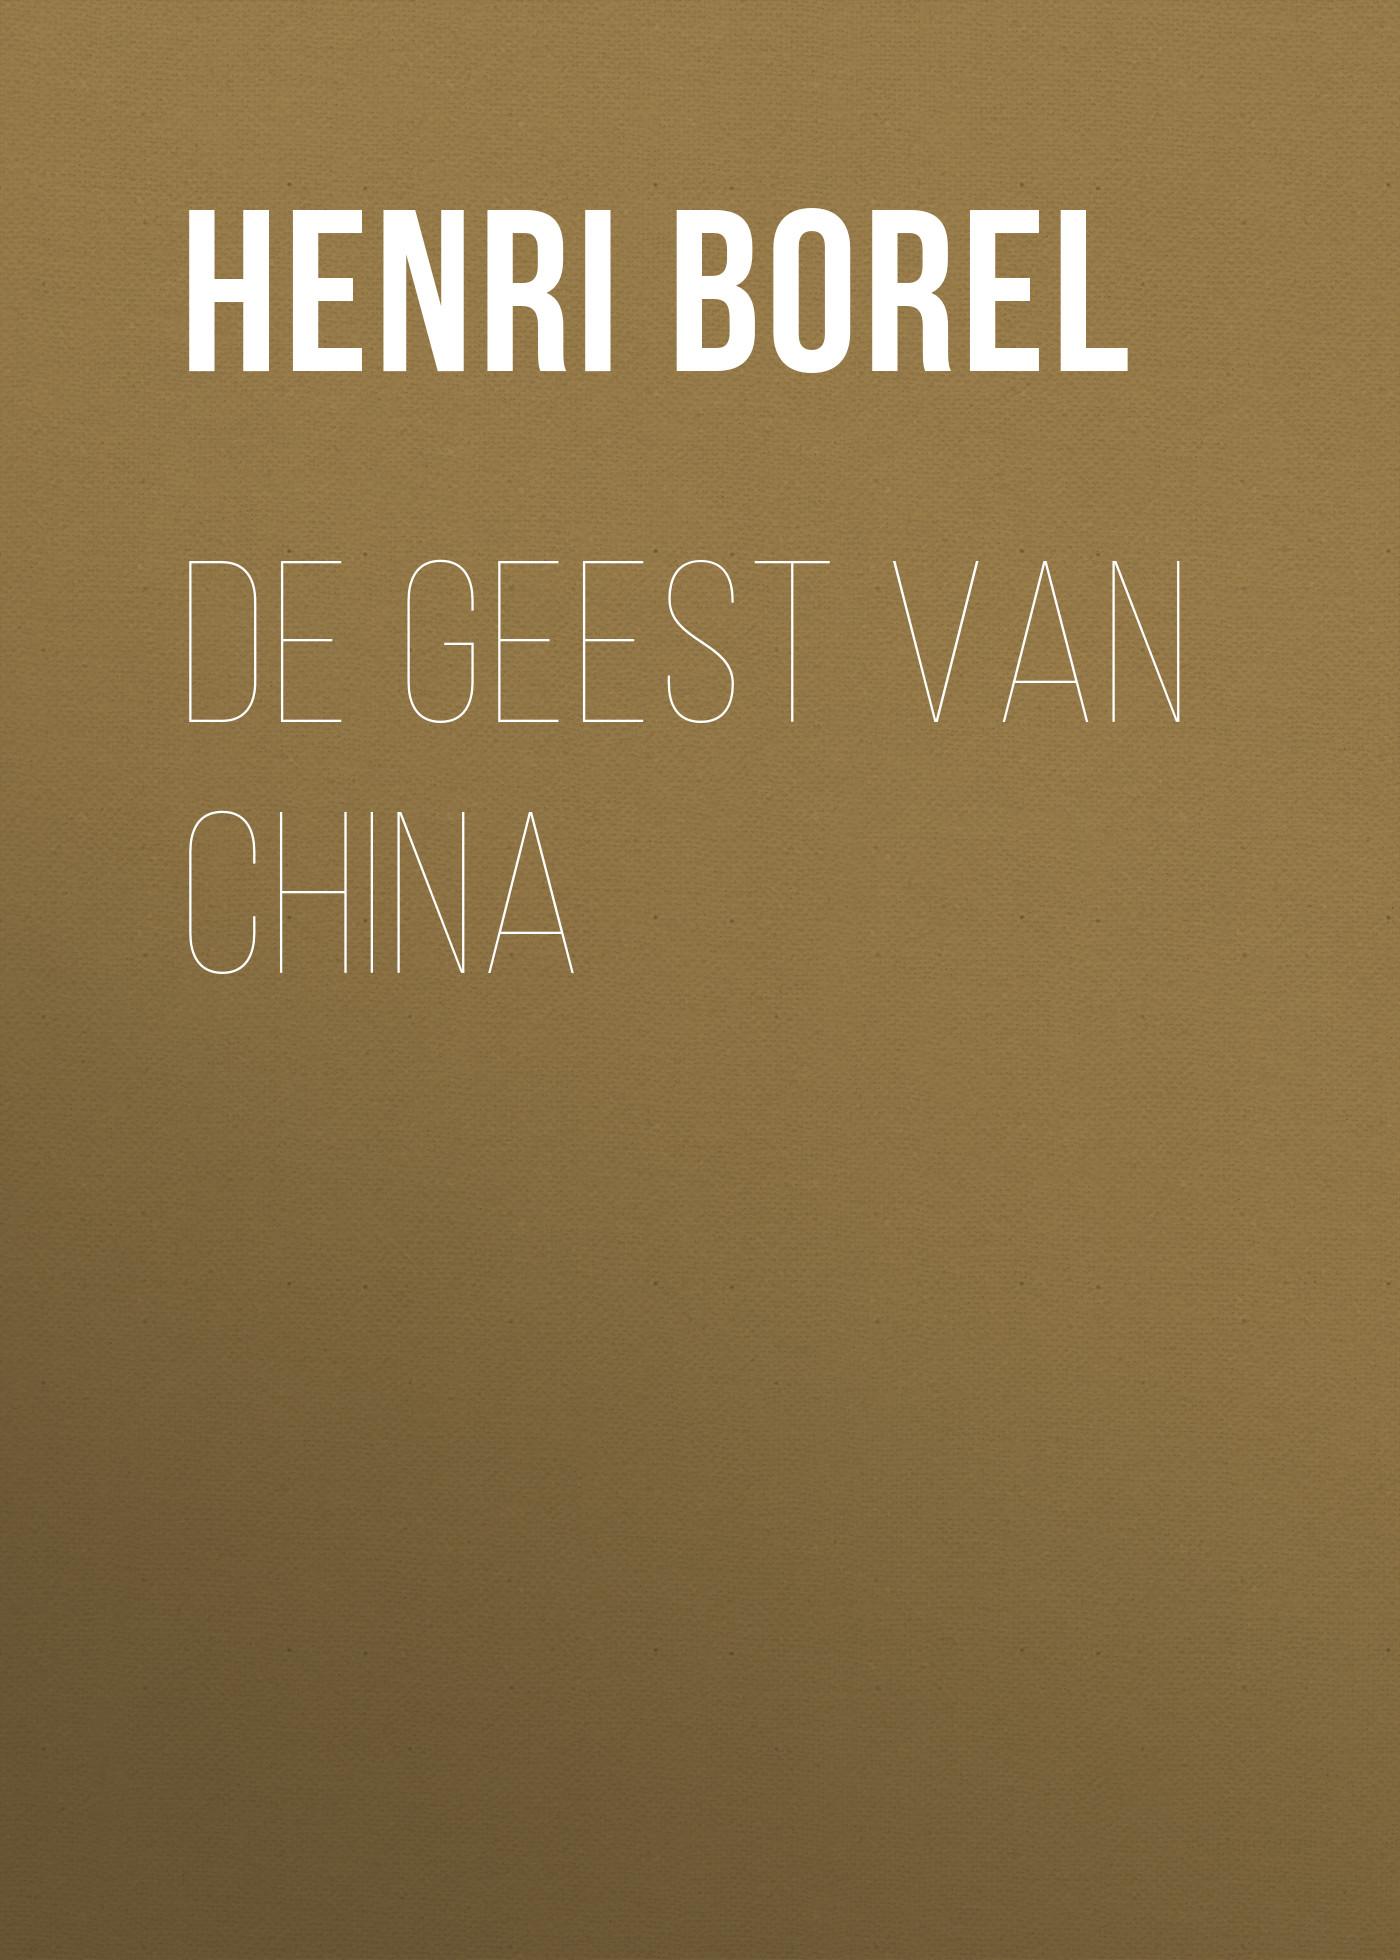 Borel Henri Jean François De Geest van China цена 2017